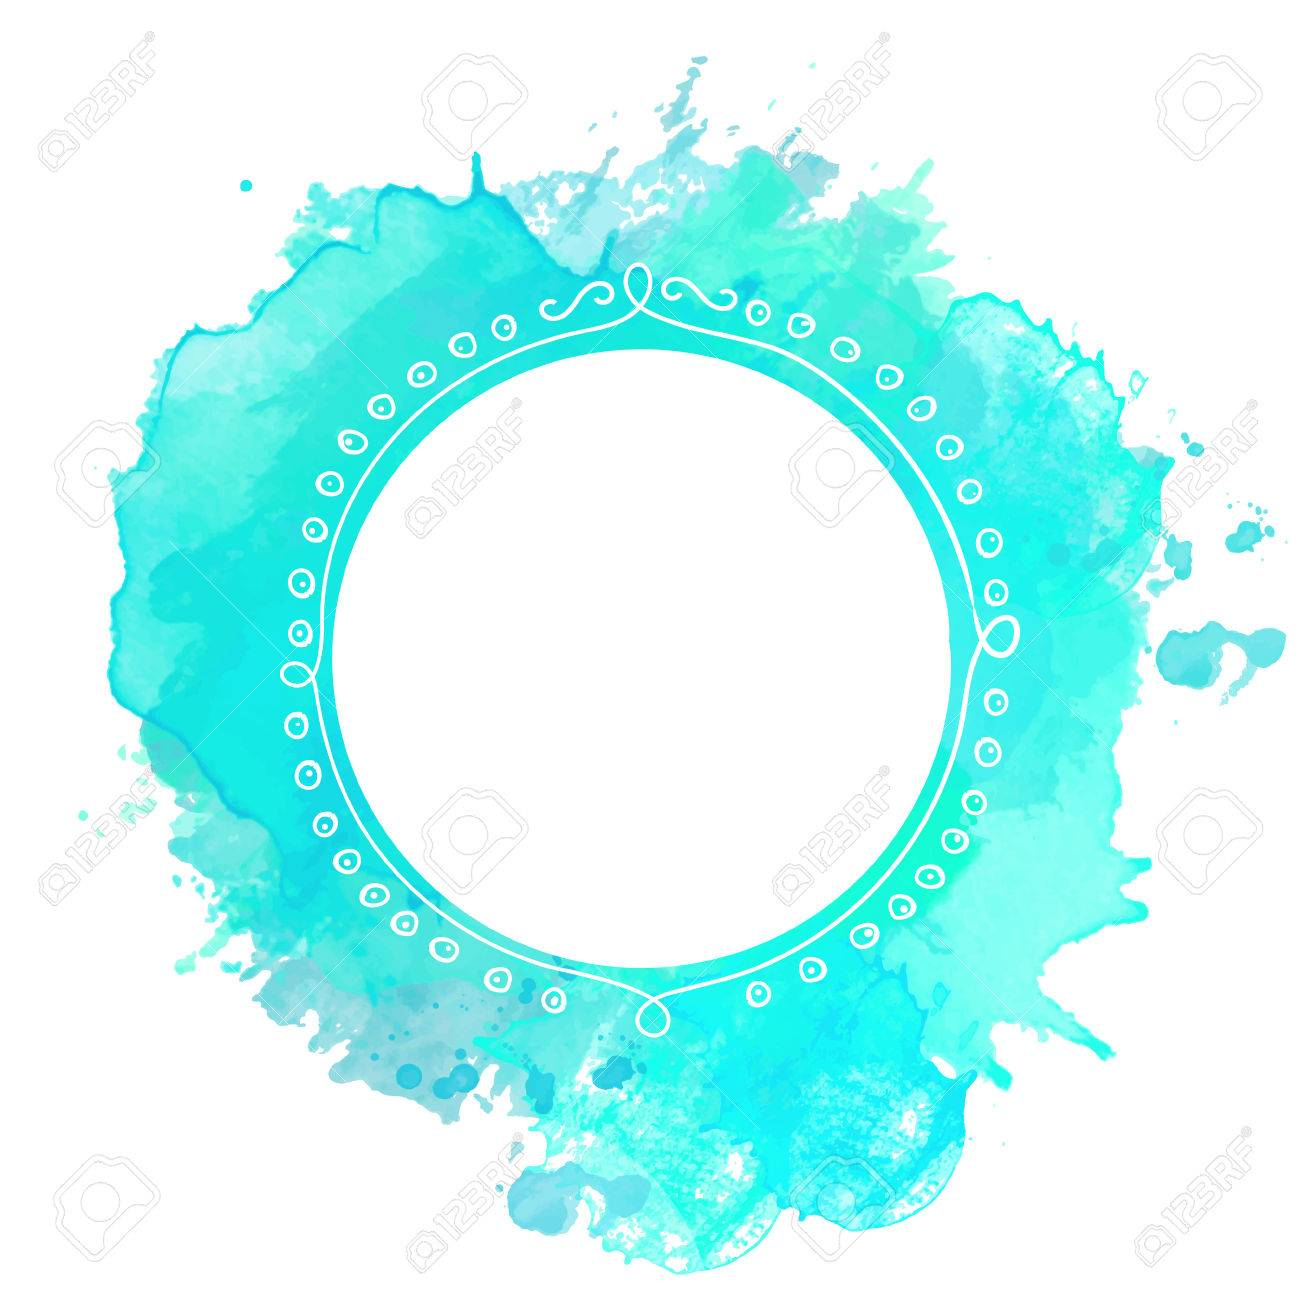 marco del doodle blanco sobre fondo azul turquesa chapoteo de la pintura vector teln de